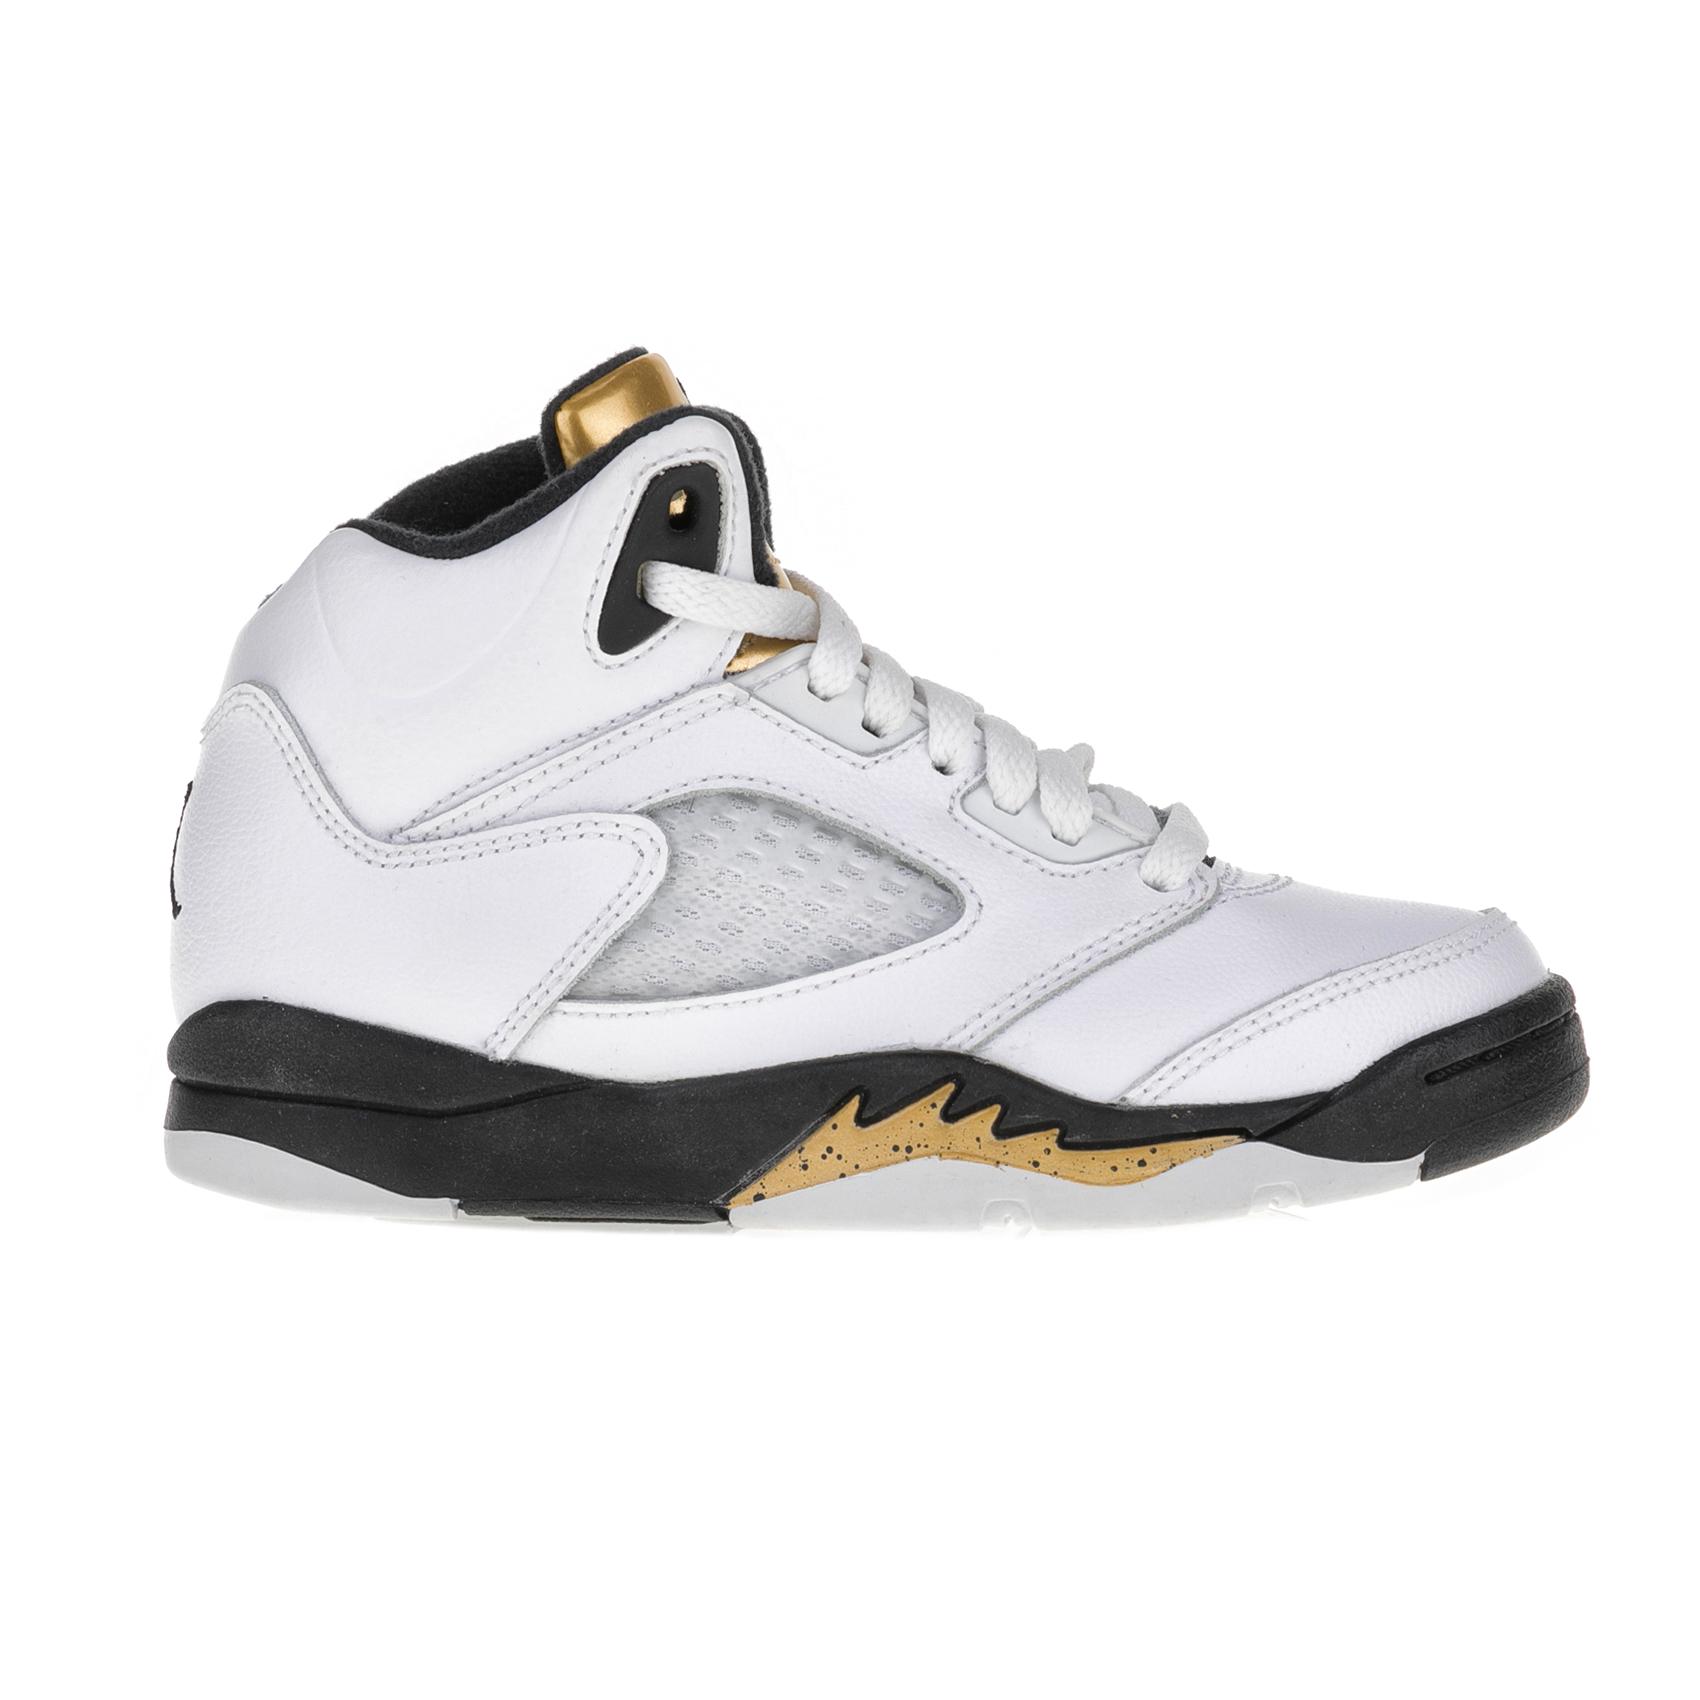 NIKE – Παιδικά αθλητικά παπούτσια Nike JORDAN 5 RETRO BP λευκά – μαύρα